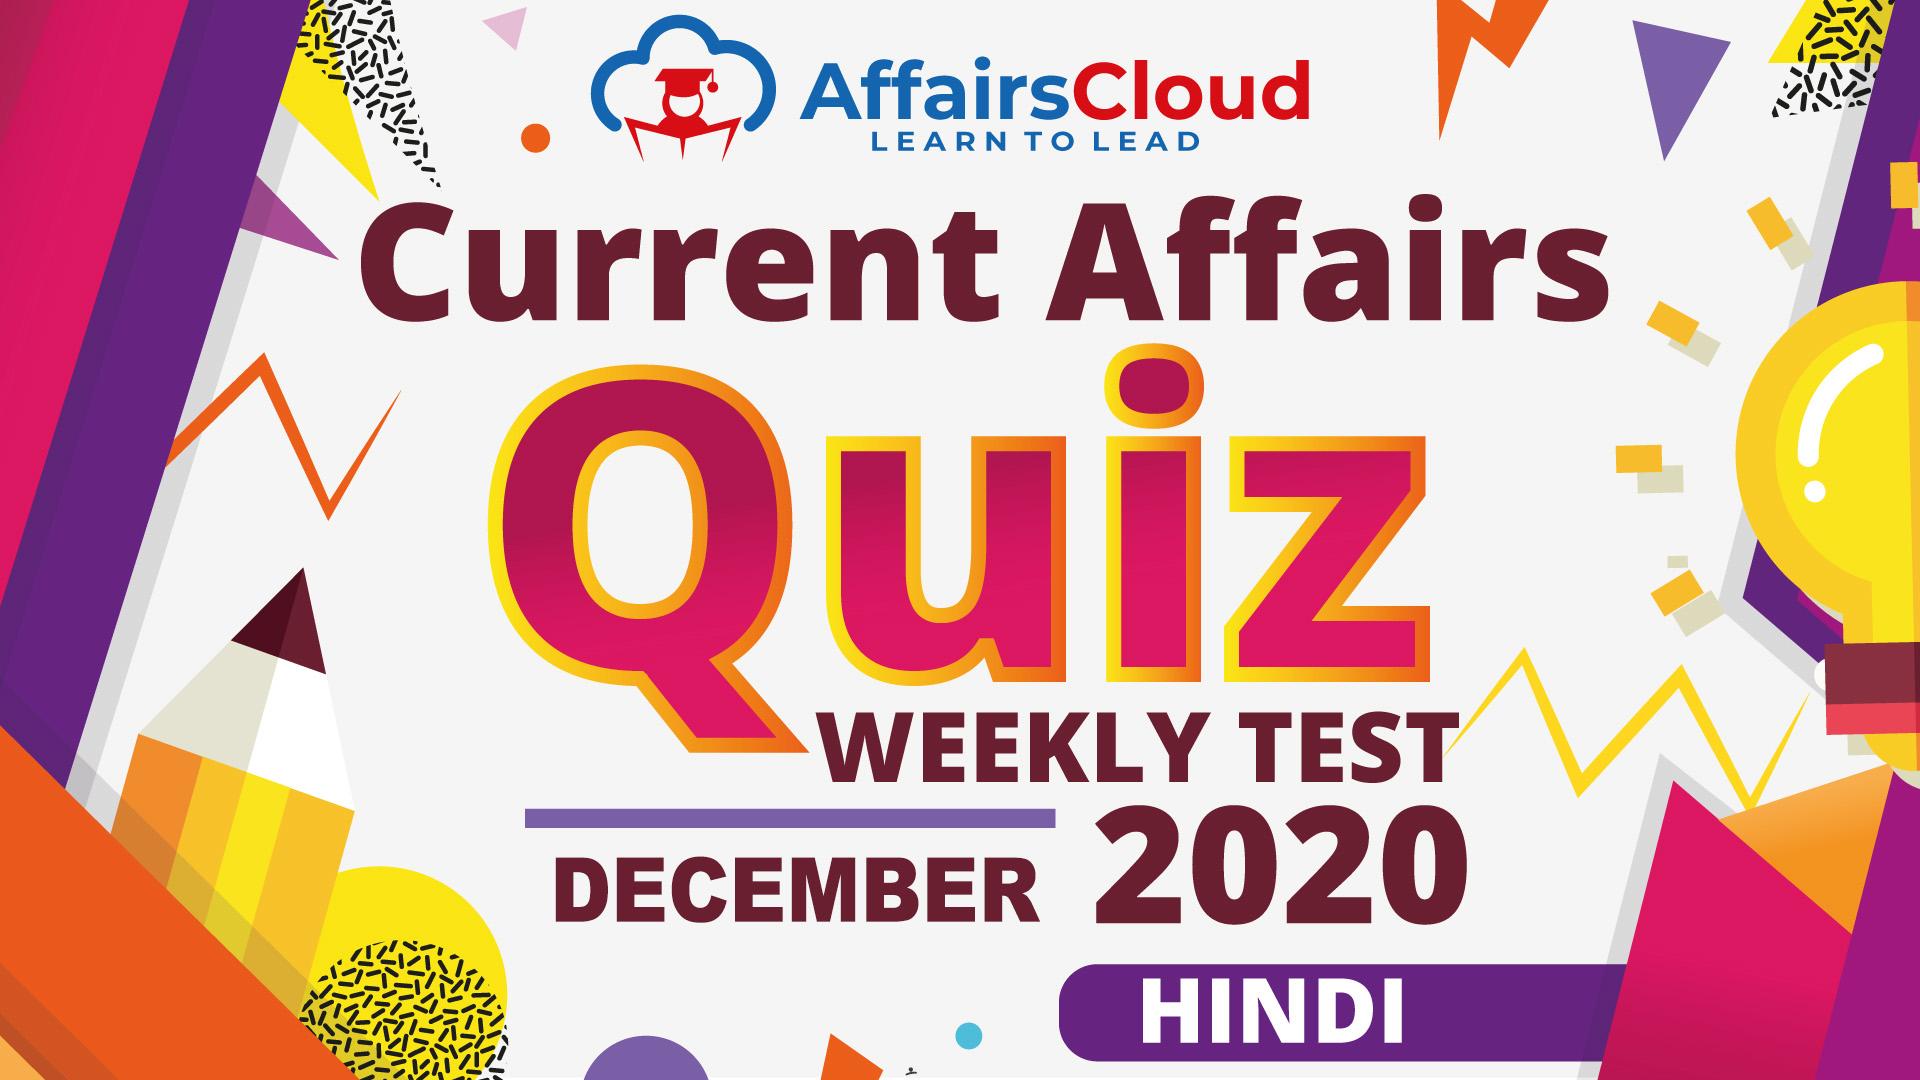 Current Affairs Weekly Quiz December 2020 Hindi